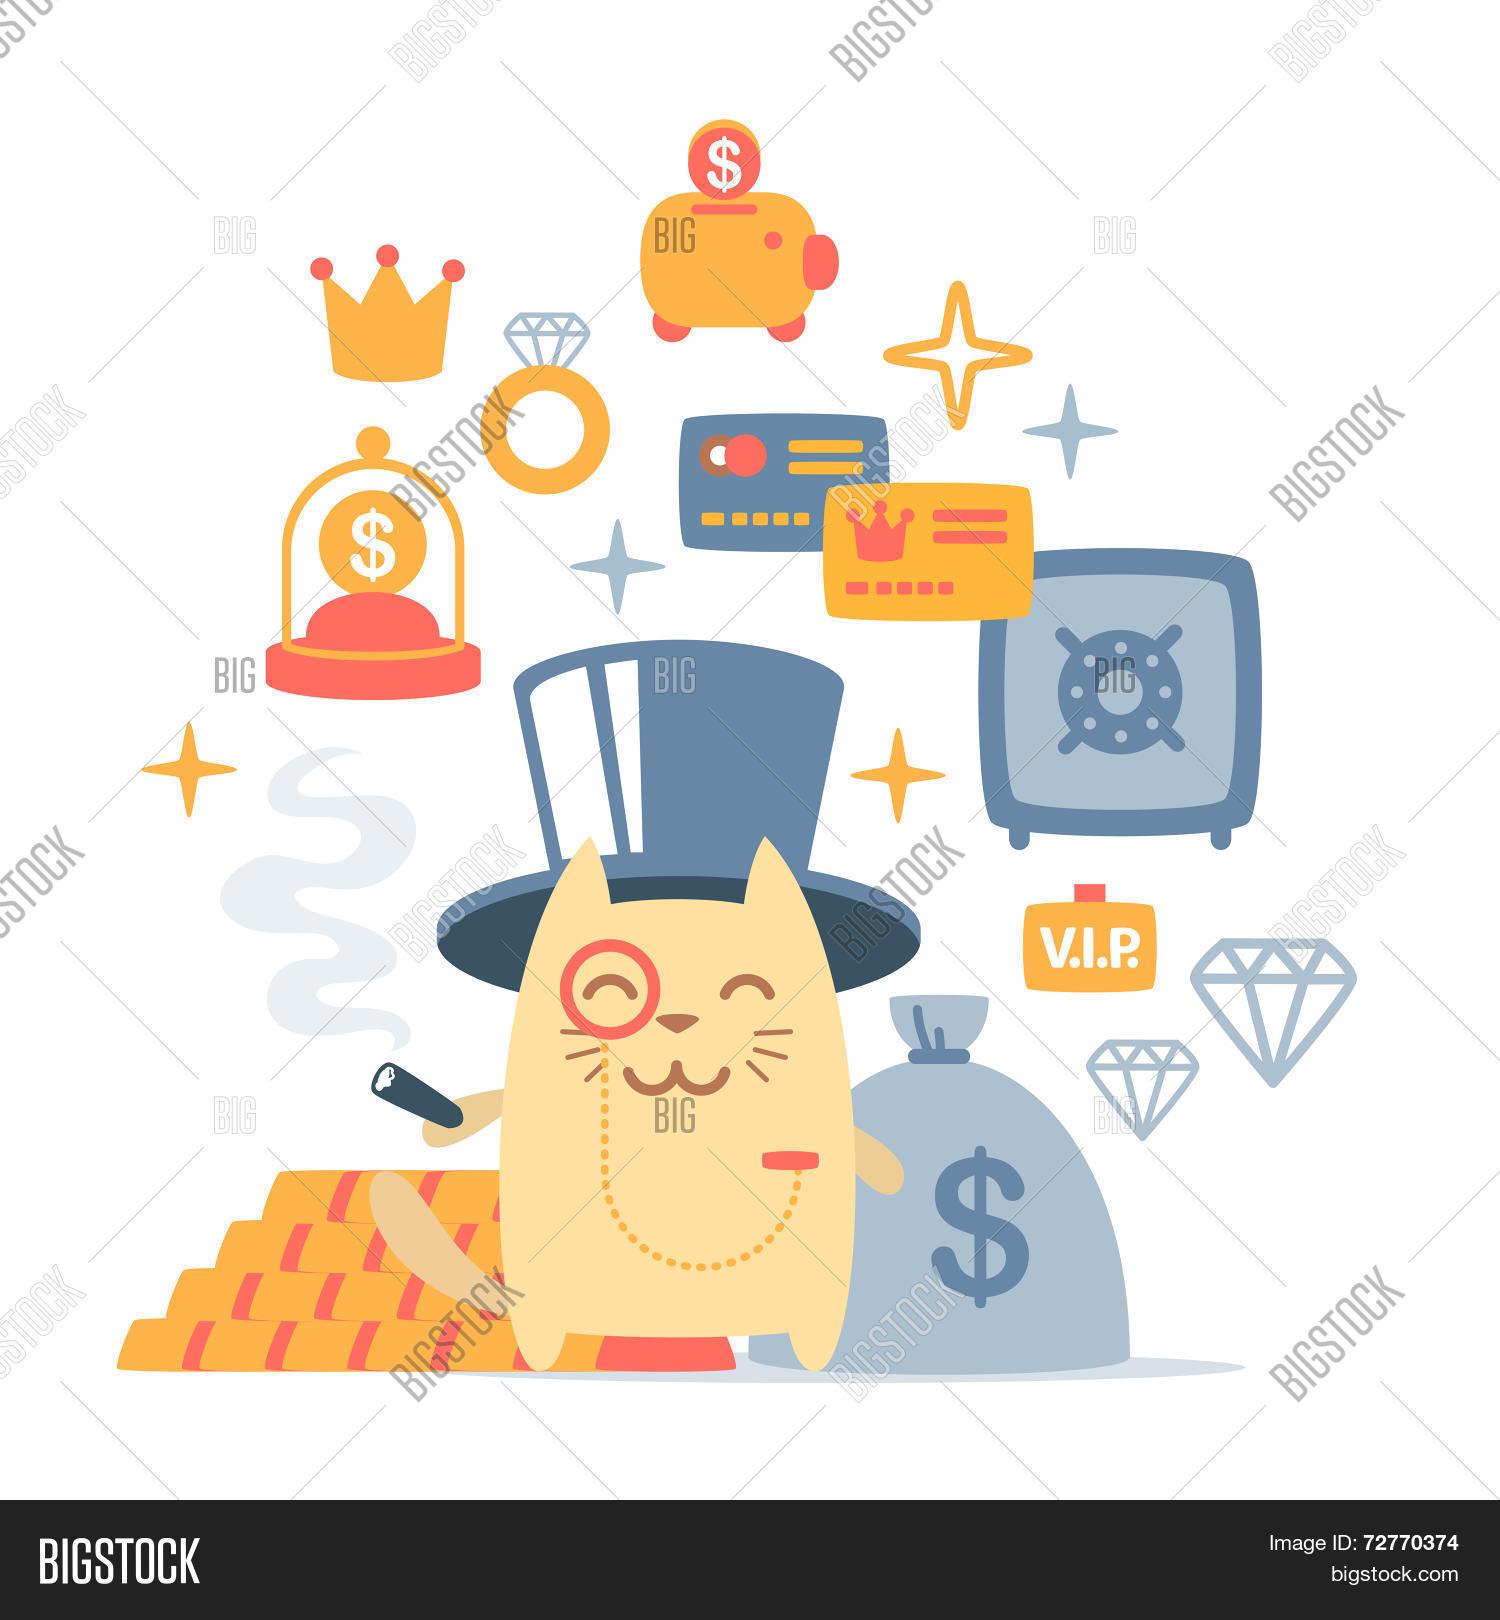 animal,attitude,bag,bank,banker,bar,billionaire,boss,bucks,bullion,business,card,cartoon,cat,ceo,character,cigar,coin,crown,cute,diamond,dollar,finance,gold,graphic,greedy,illustration,inheritance,investments,investor,luxury,manga,many,market,millionaire,money,moneybags,owner,piggy,rich,ring,safe,savings,smart,status,stock,success,tuxedo,vector,vip,wealthy